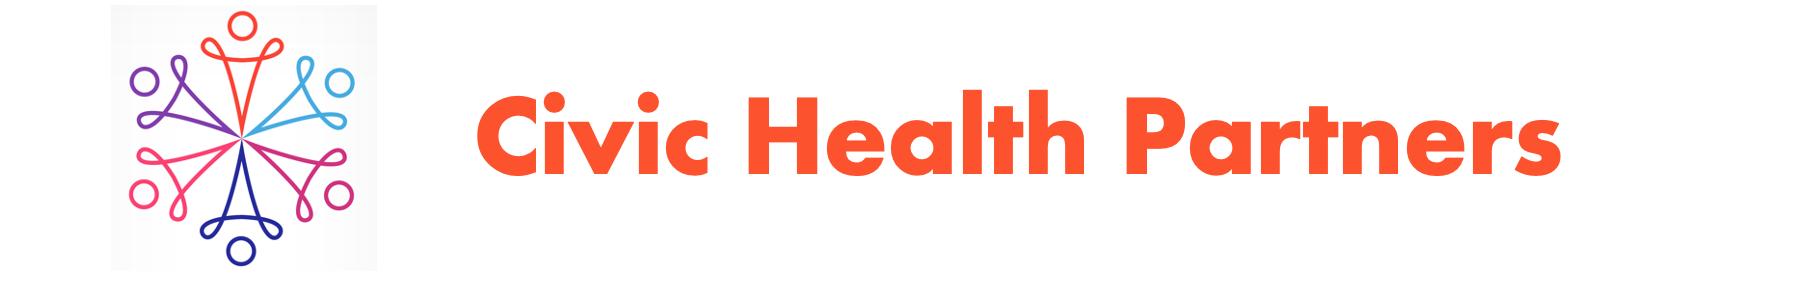 Civic Health Partners